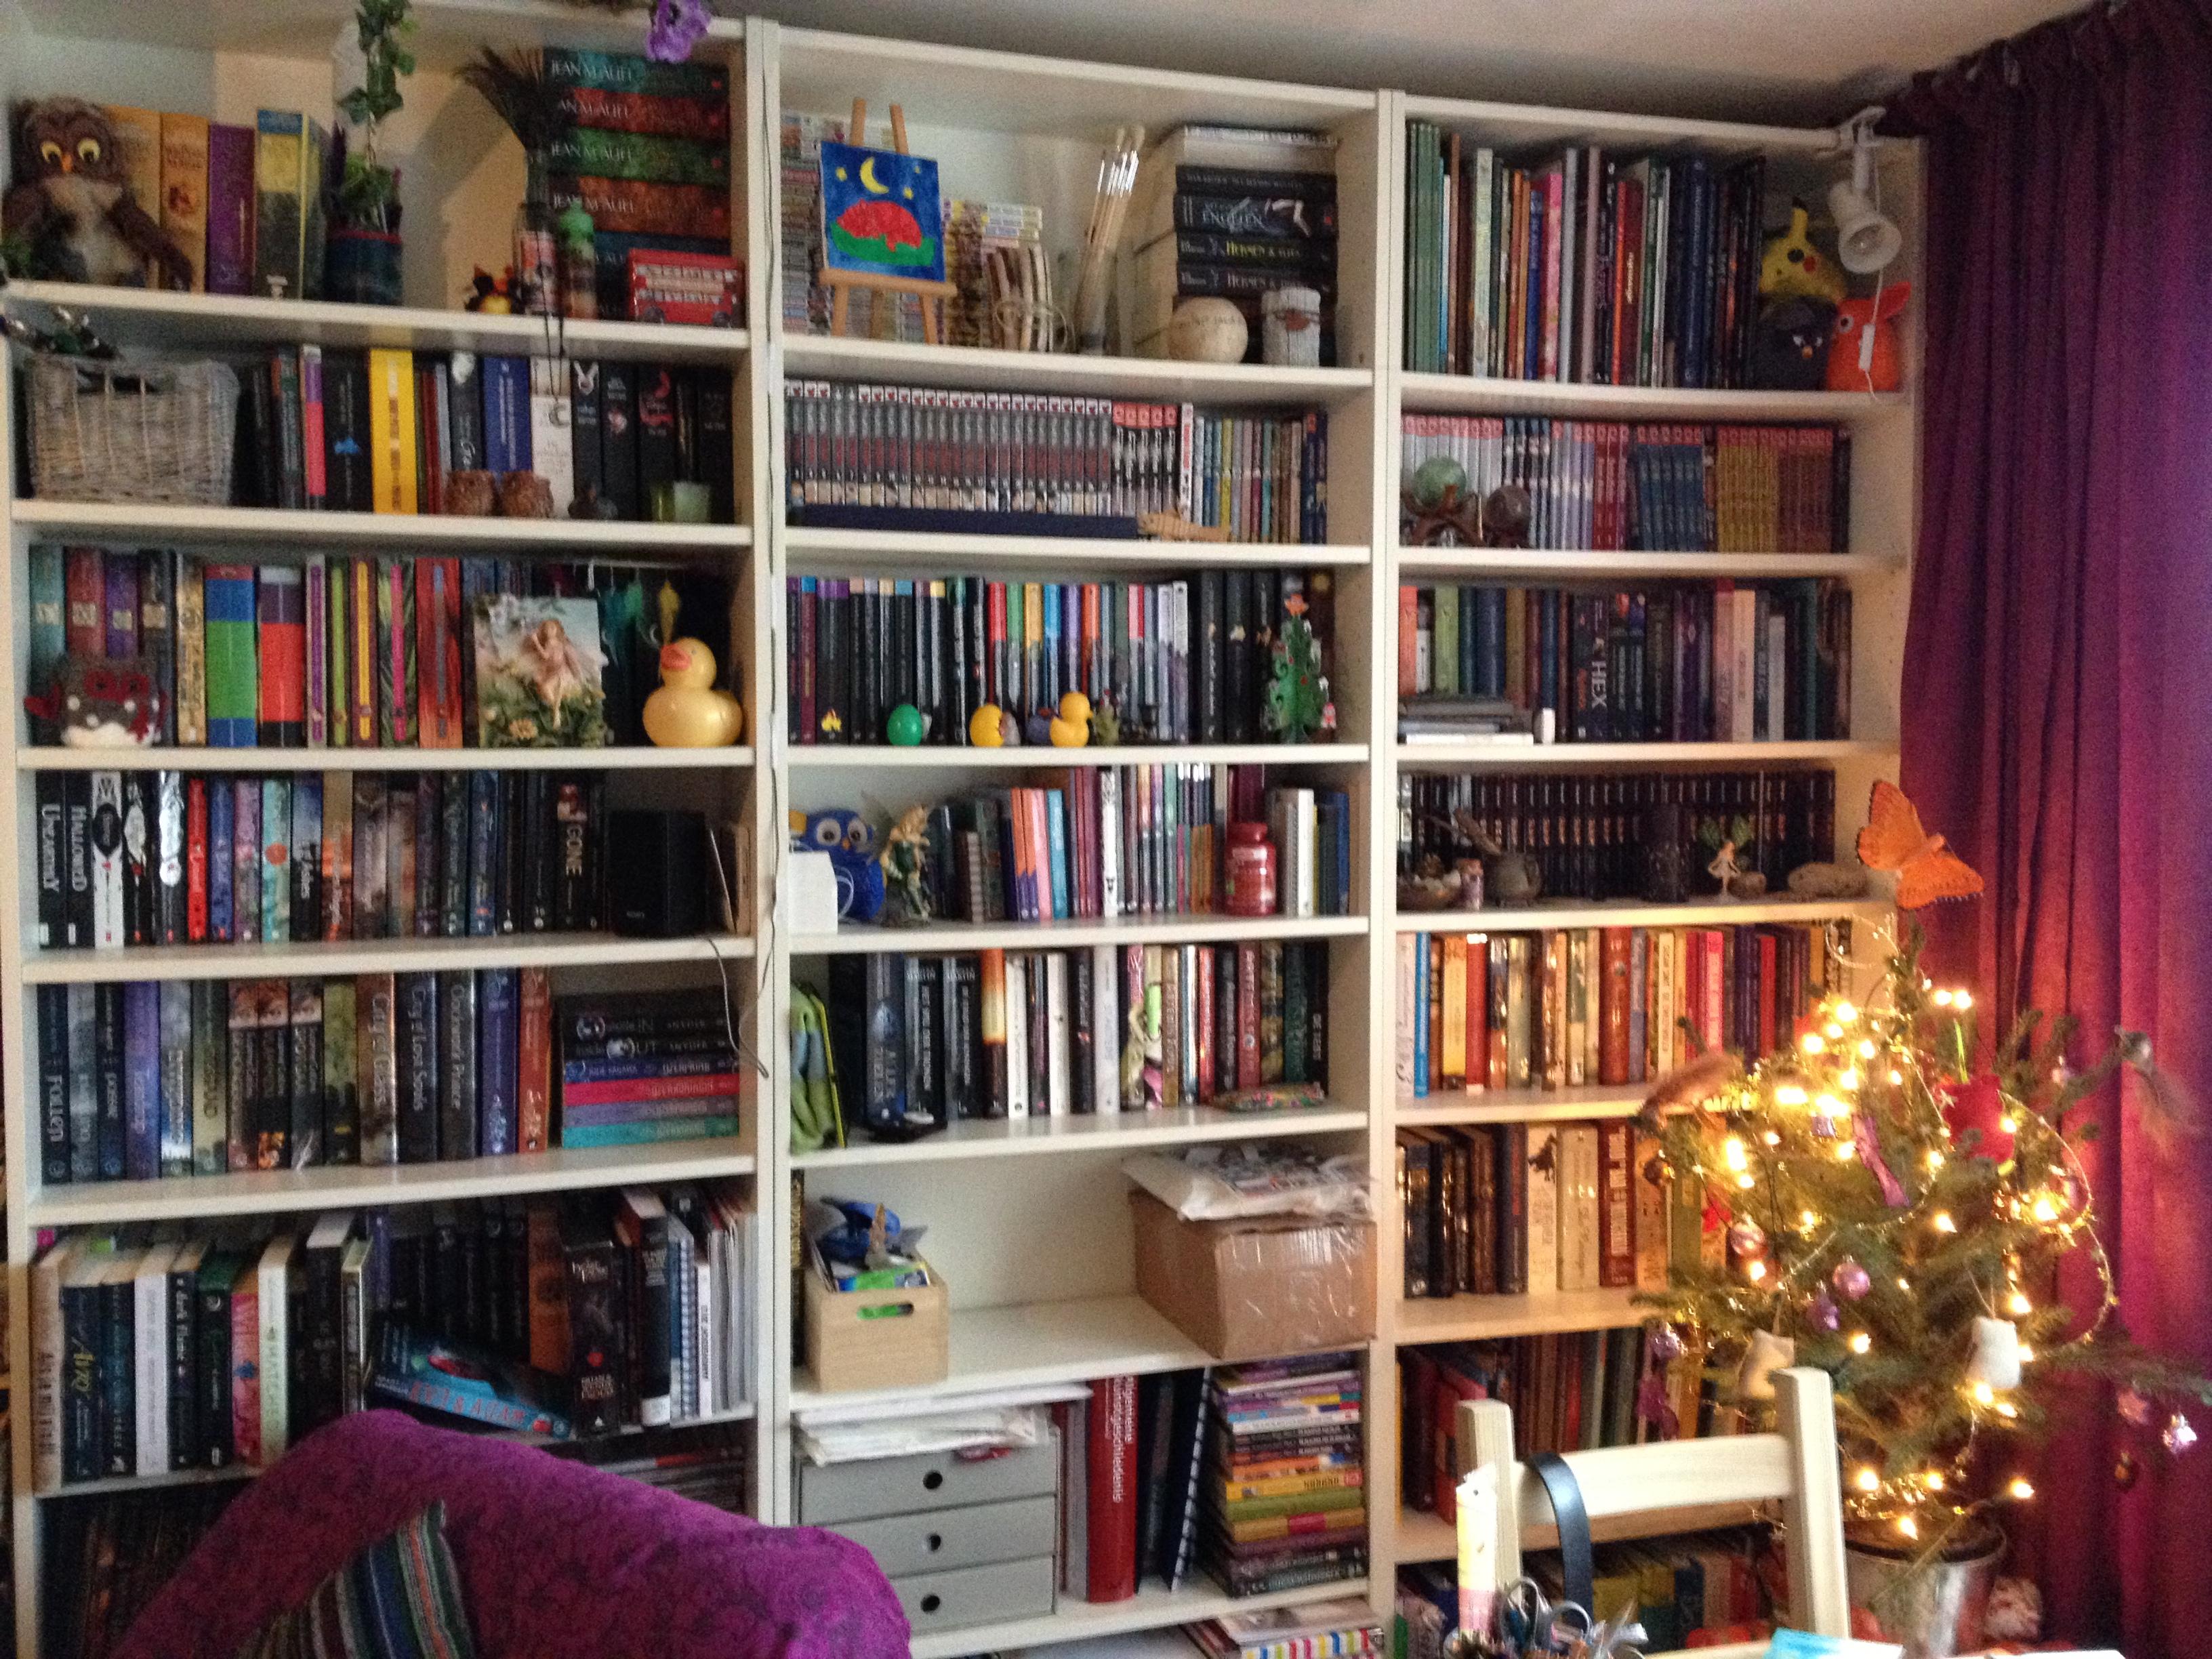 https://i2.wp.com/adorablebooks.nl/wp-content/uploads/2013/12/Photo-23-12-13-14-10-58.jpg